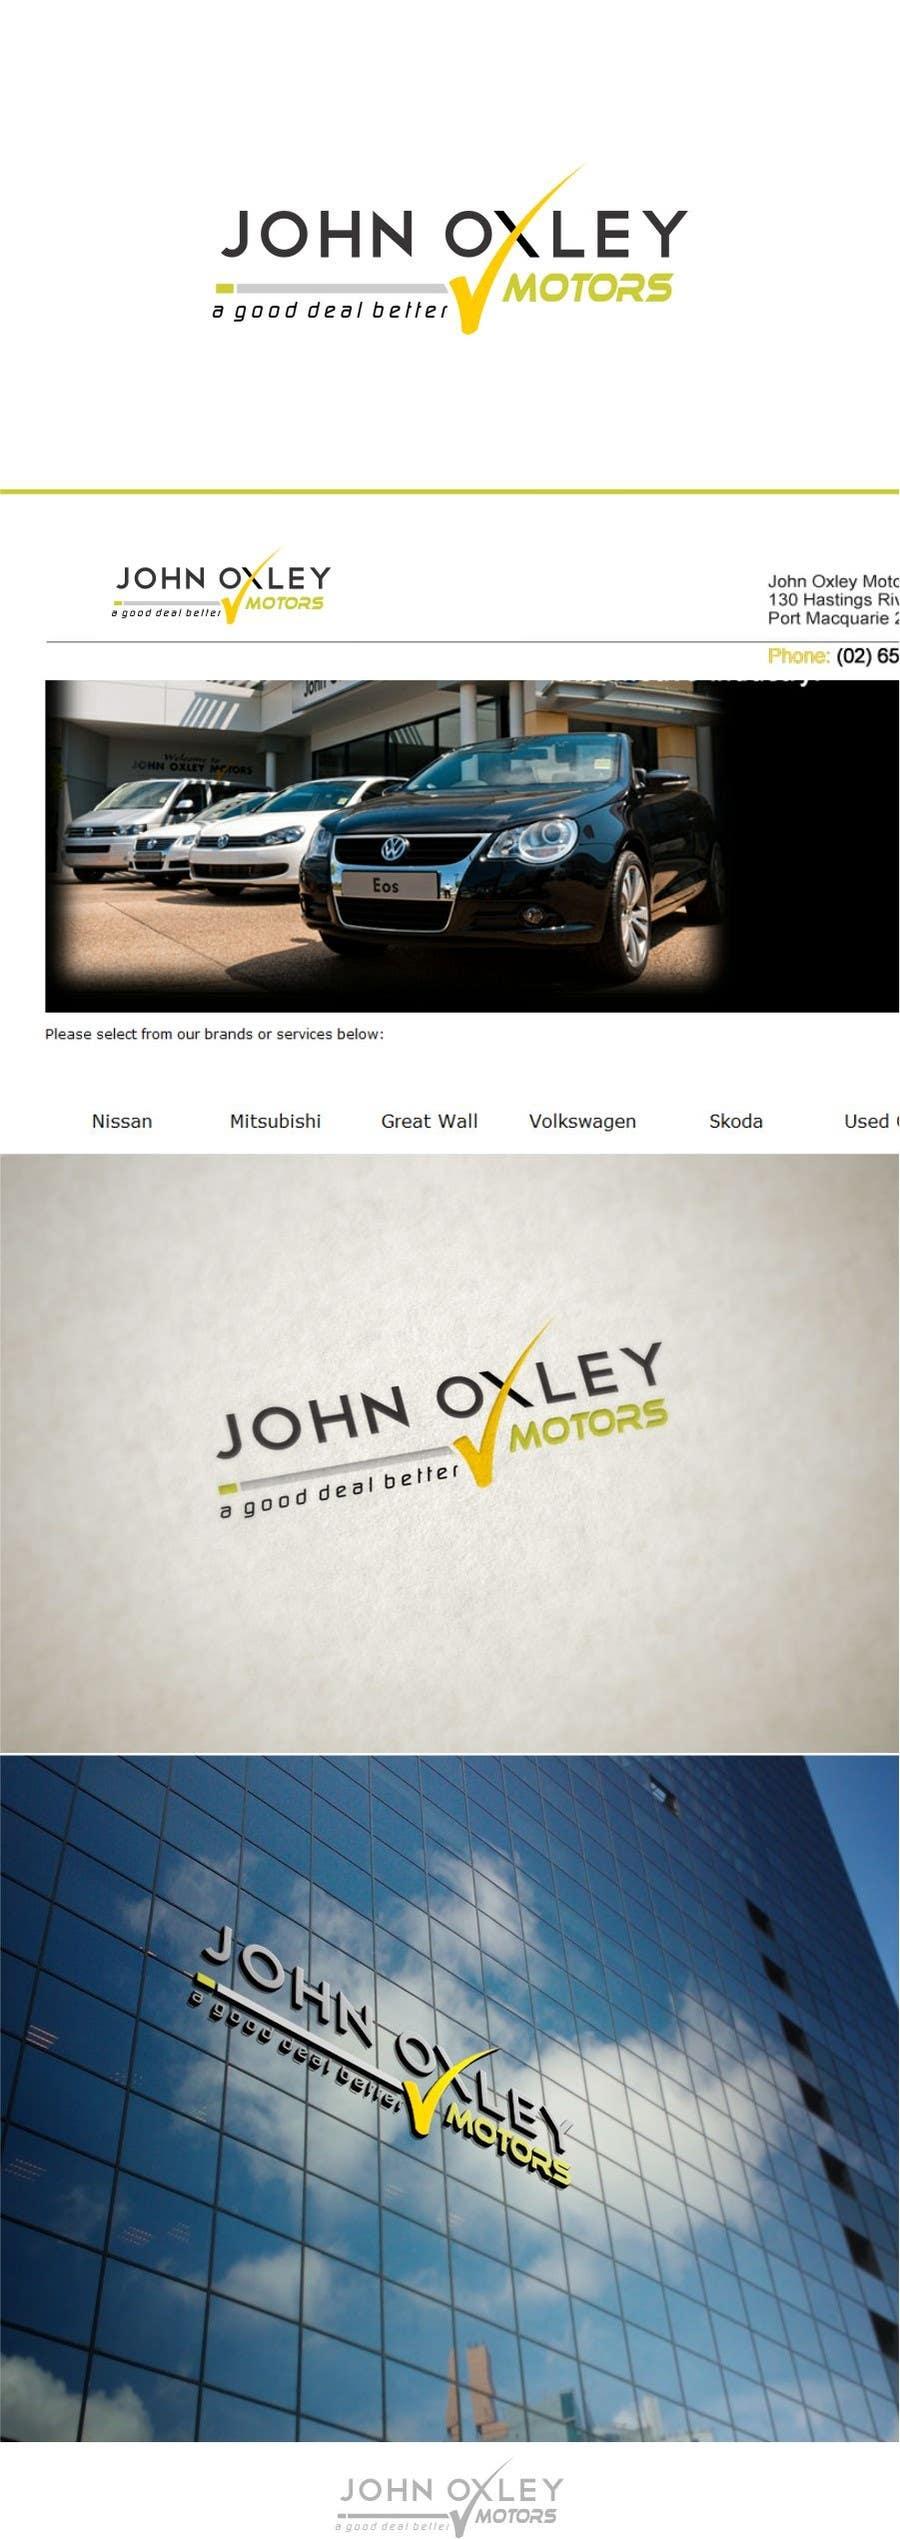 #172 for Design a Logo for John Oxley Motors by timedsgn